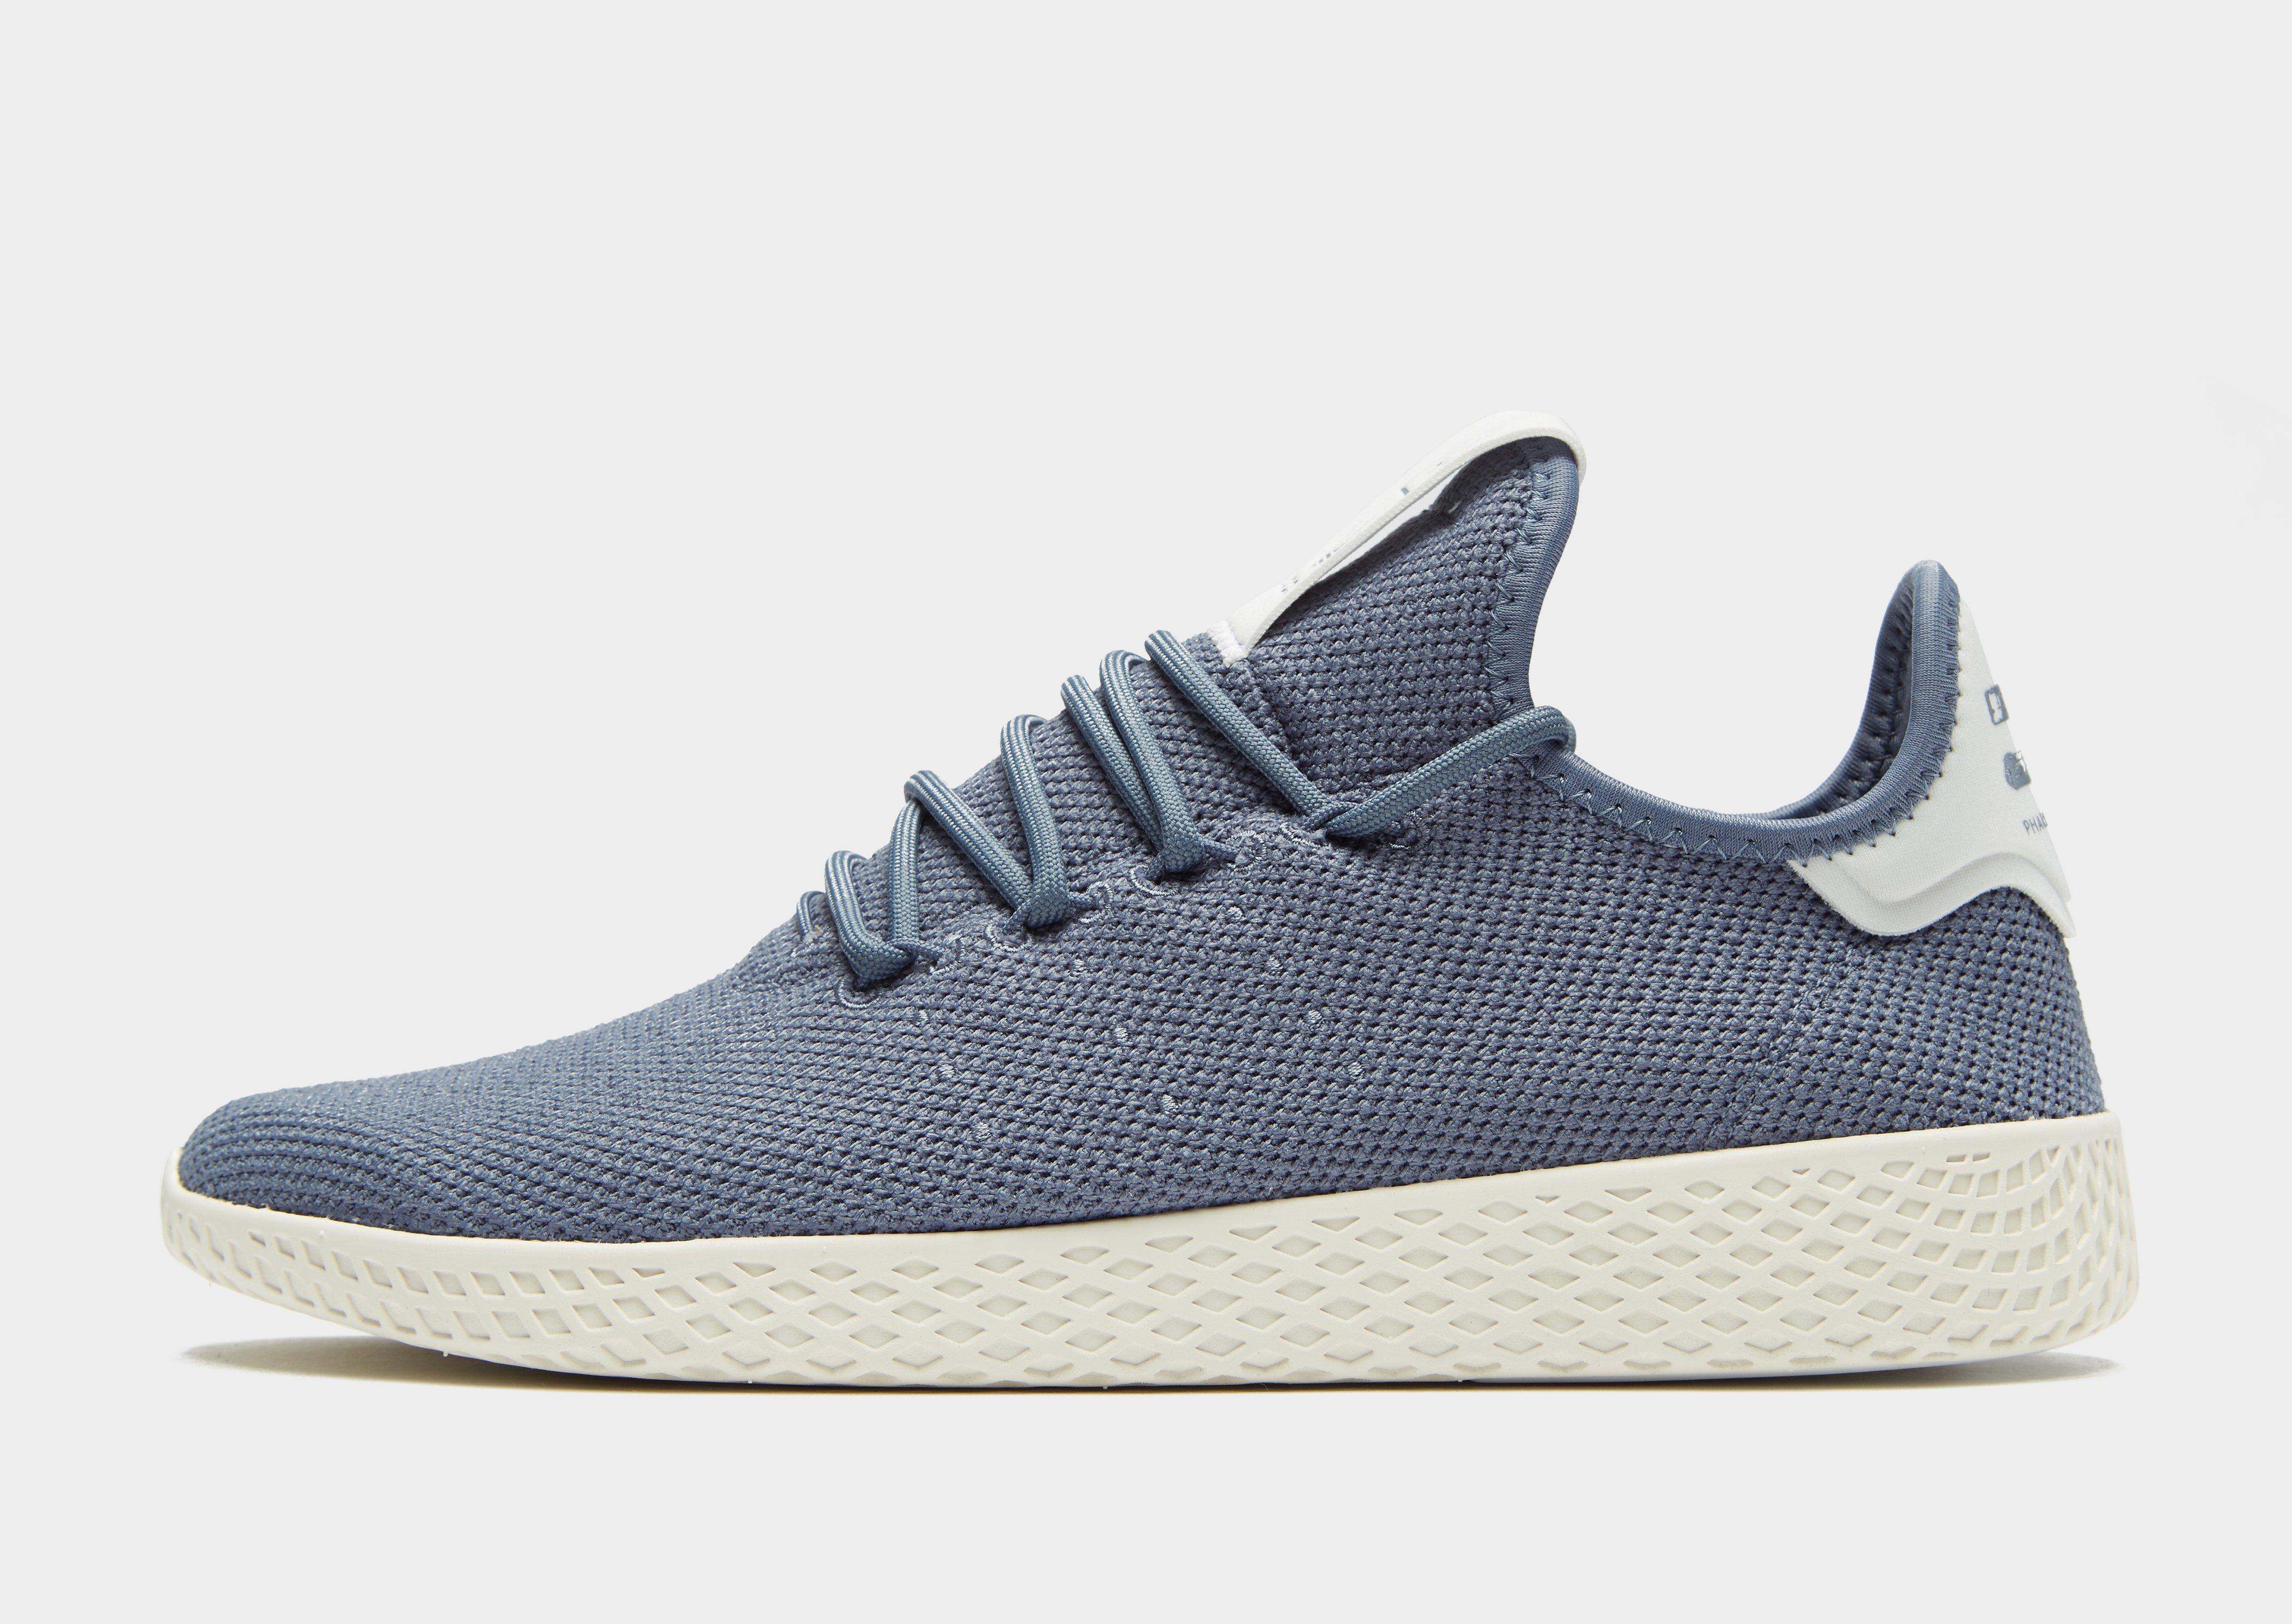 aed55668a adidas pharrell williams bleu adidas Originals x Pharrell Williams Tennis Hu  ...